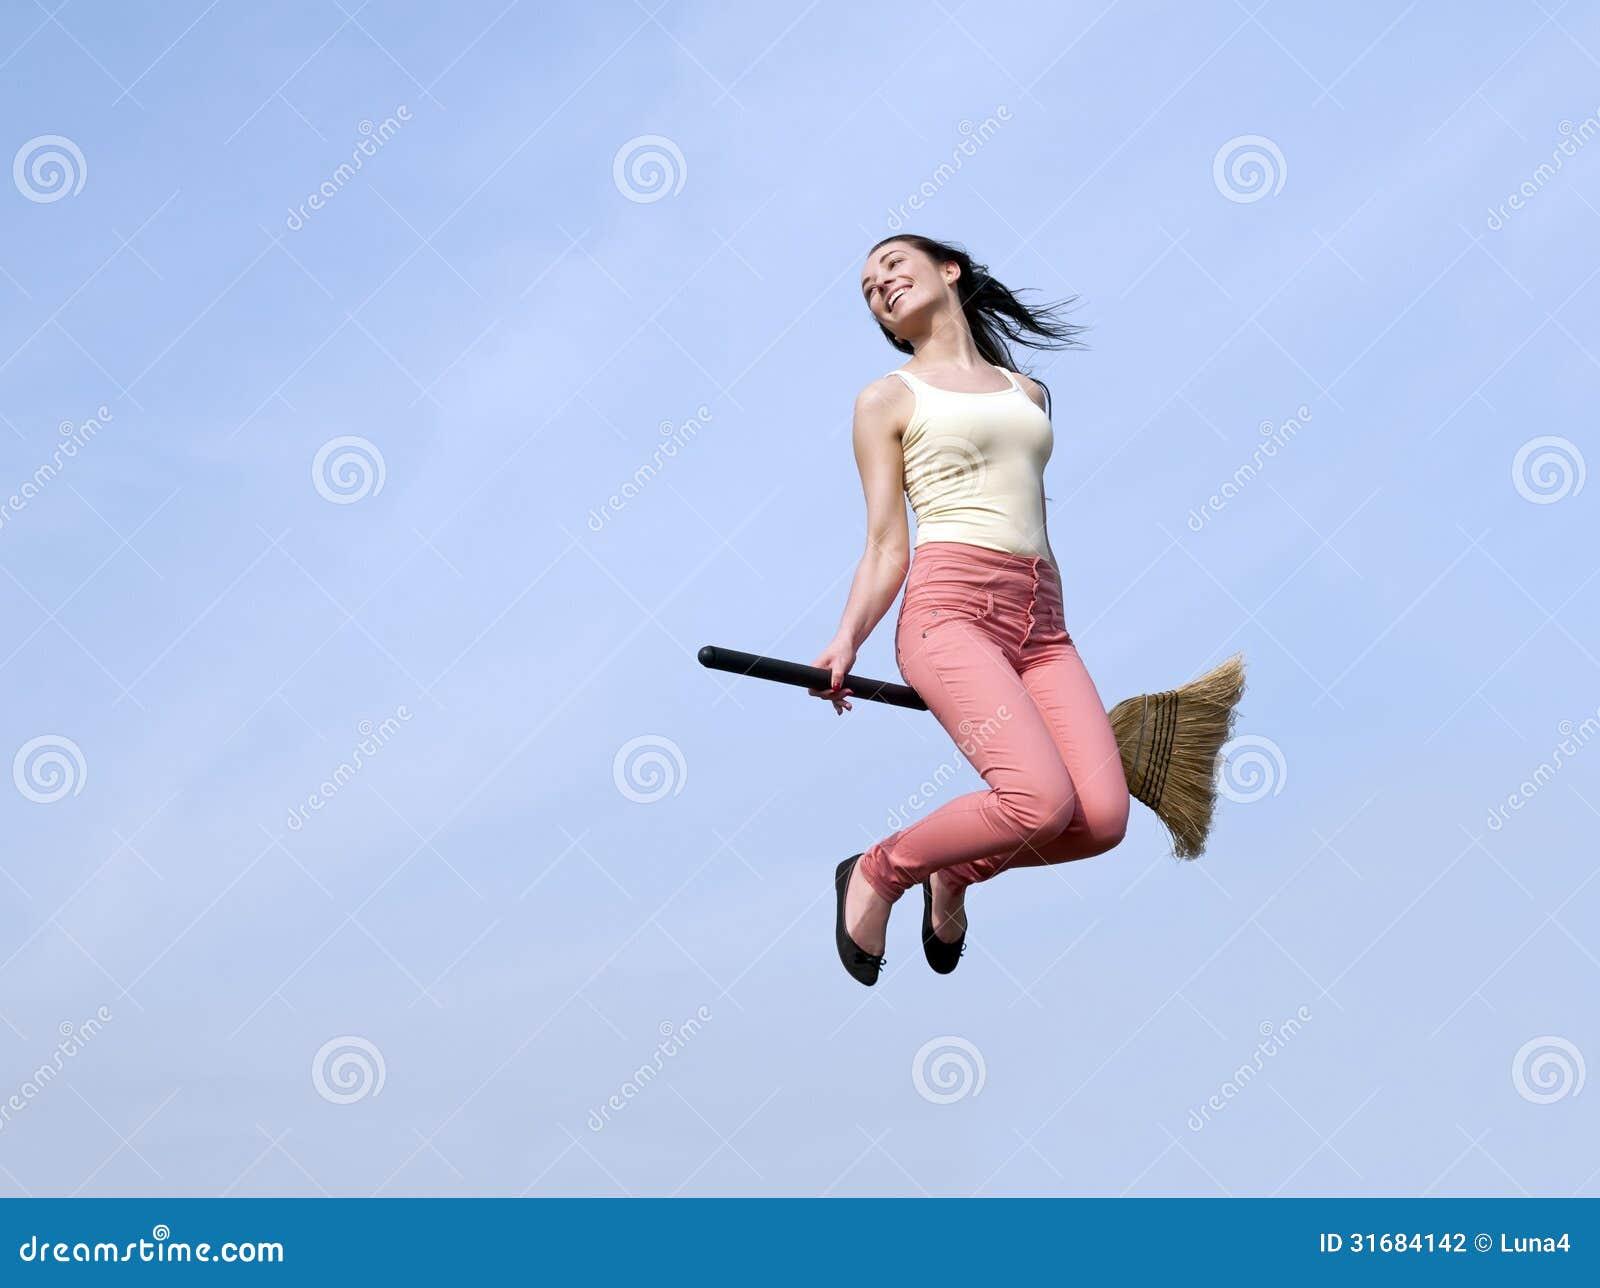 Beautiful young girl riding her vibrator